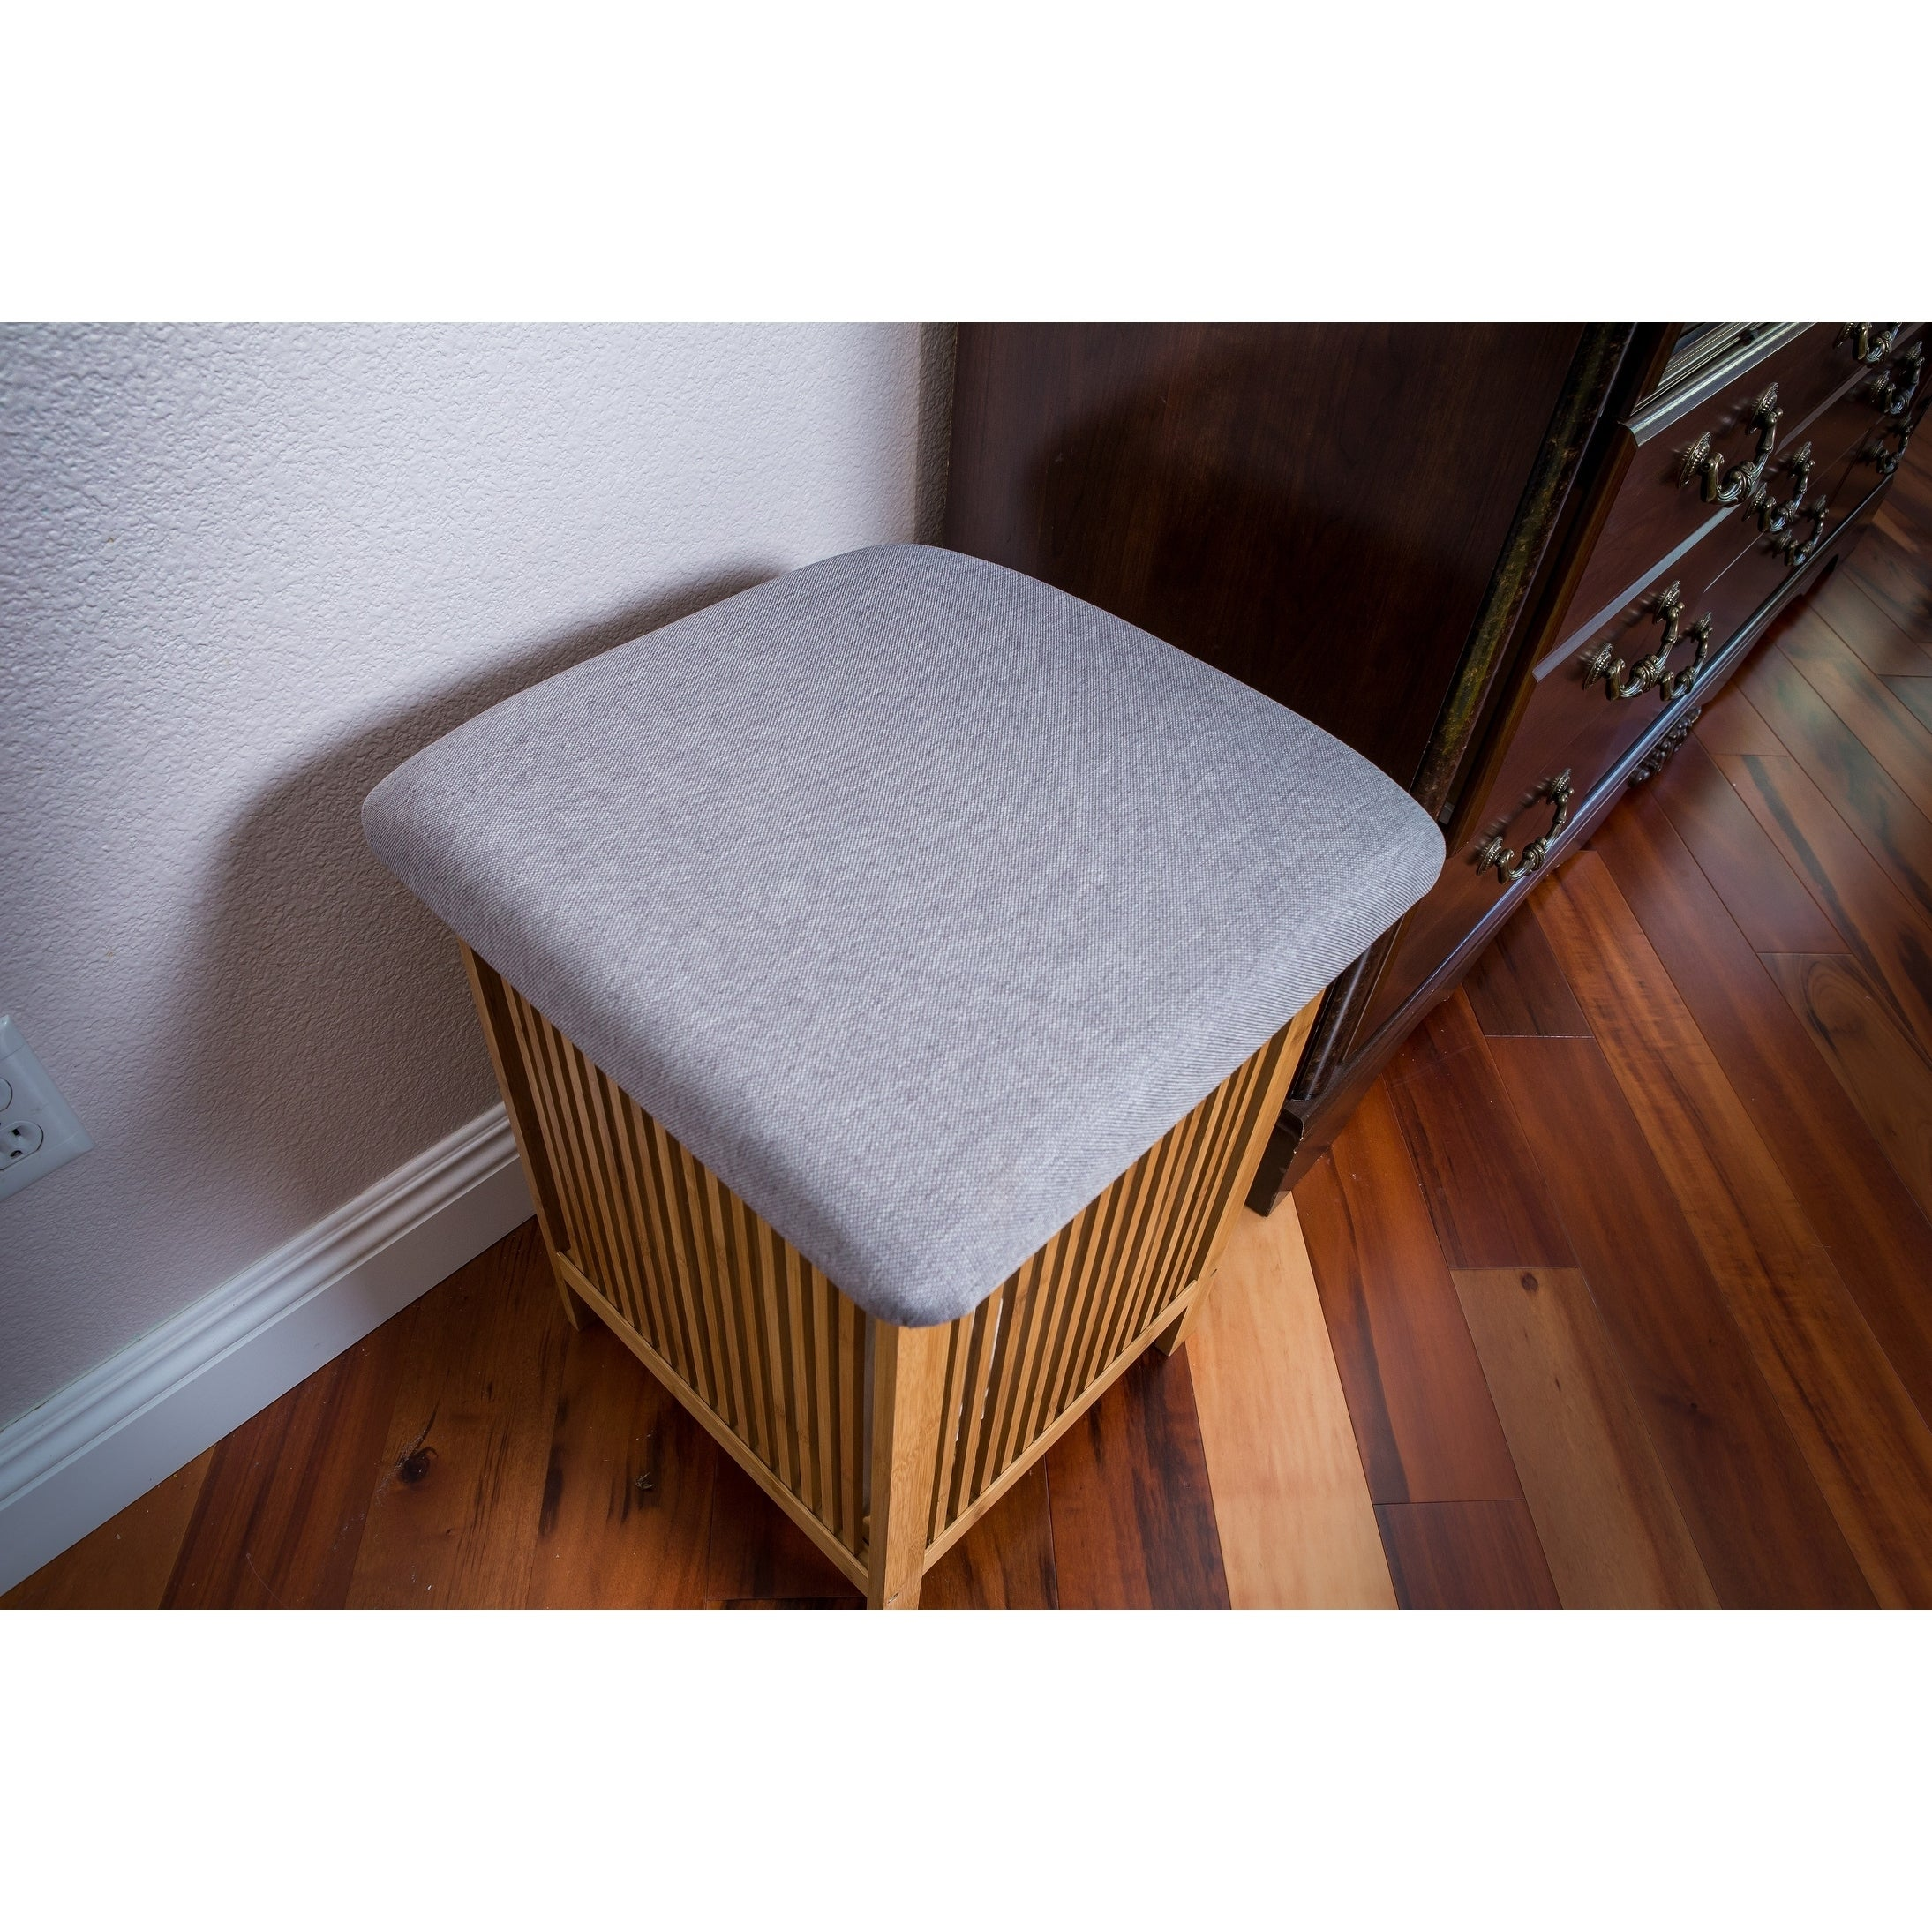 Marvelous Zora Multi Purpose Bamboo Storage Basket Ottoman 21 Inch Tall Inzonedesignstudio Interior Chair Design Inzonedesignstudiocom